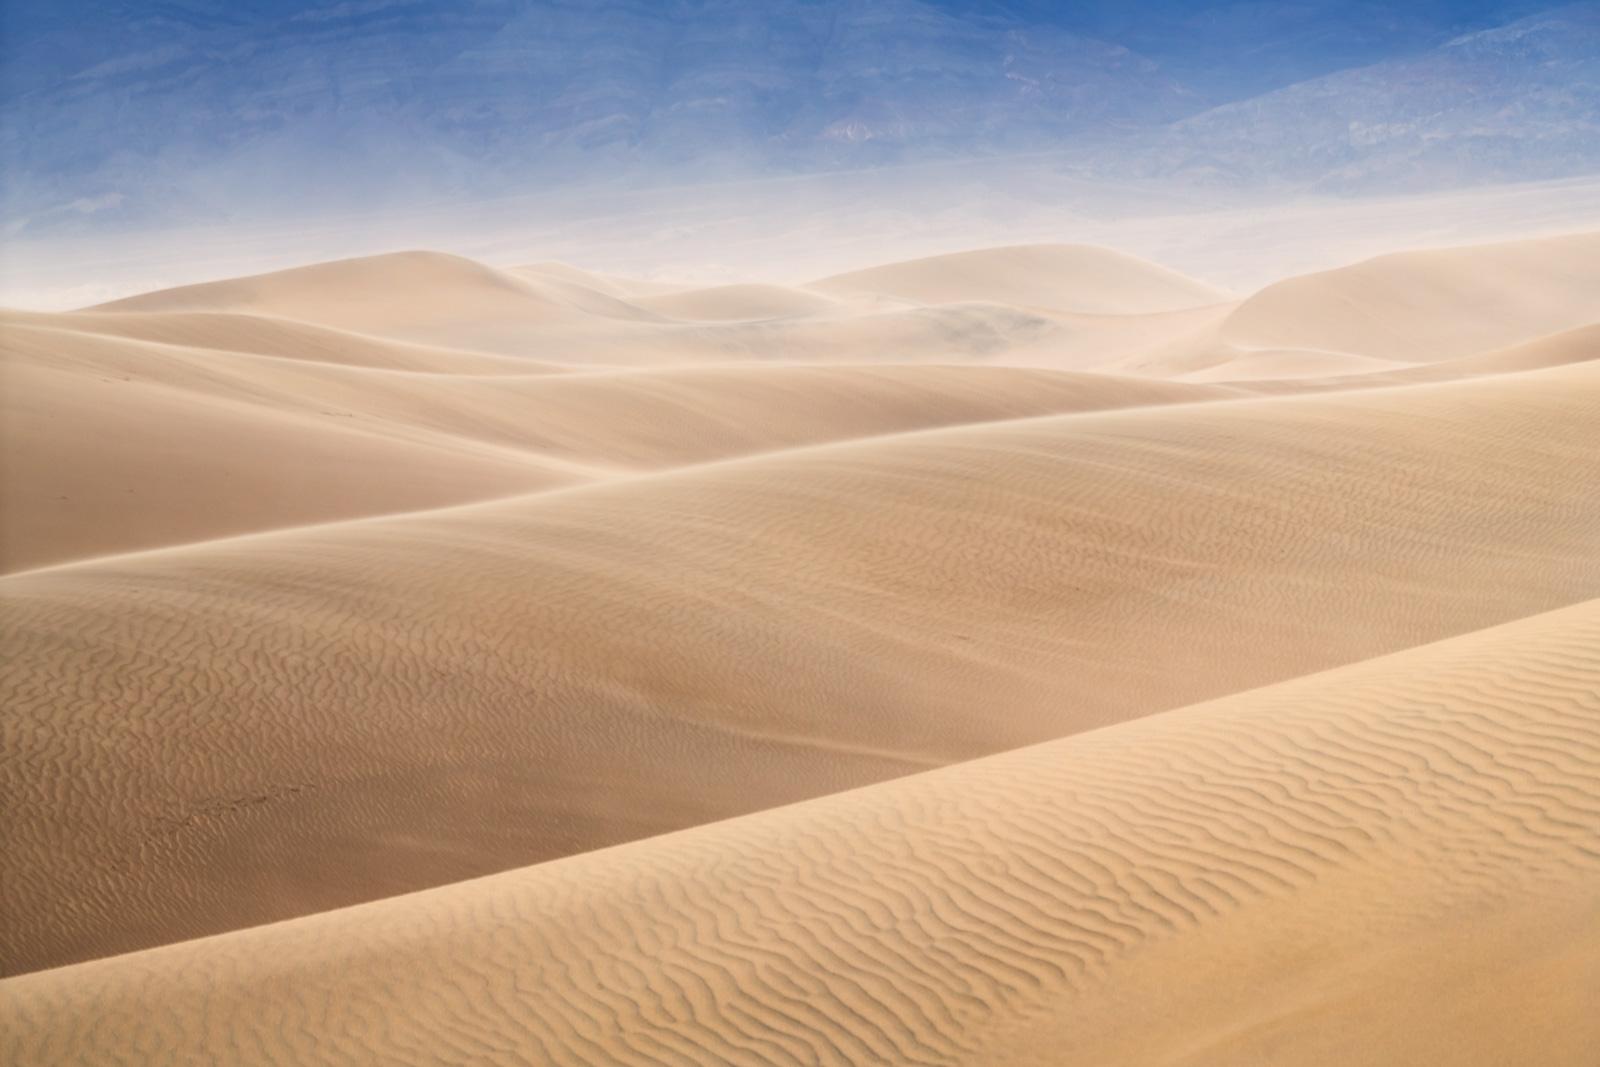 California, Death Valley, Sand, Dunes, limited edition, photograph, fine art, landscape, photo